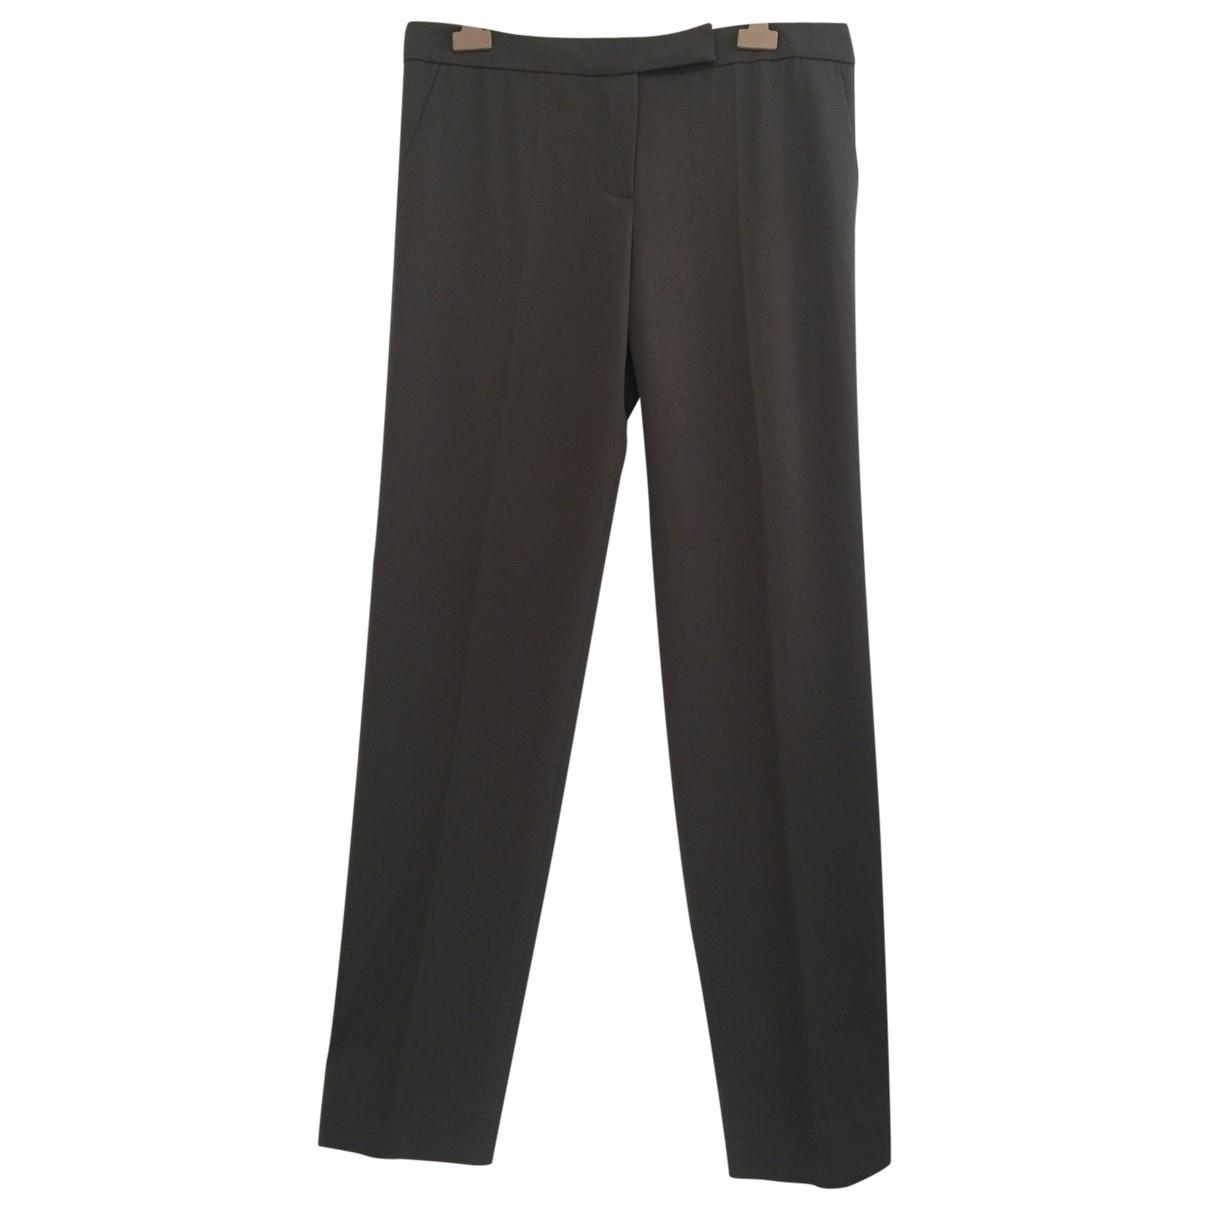 Chloé \N Khaki Wool Trousers for Women 42 FR